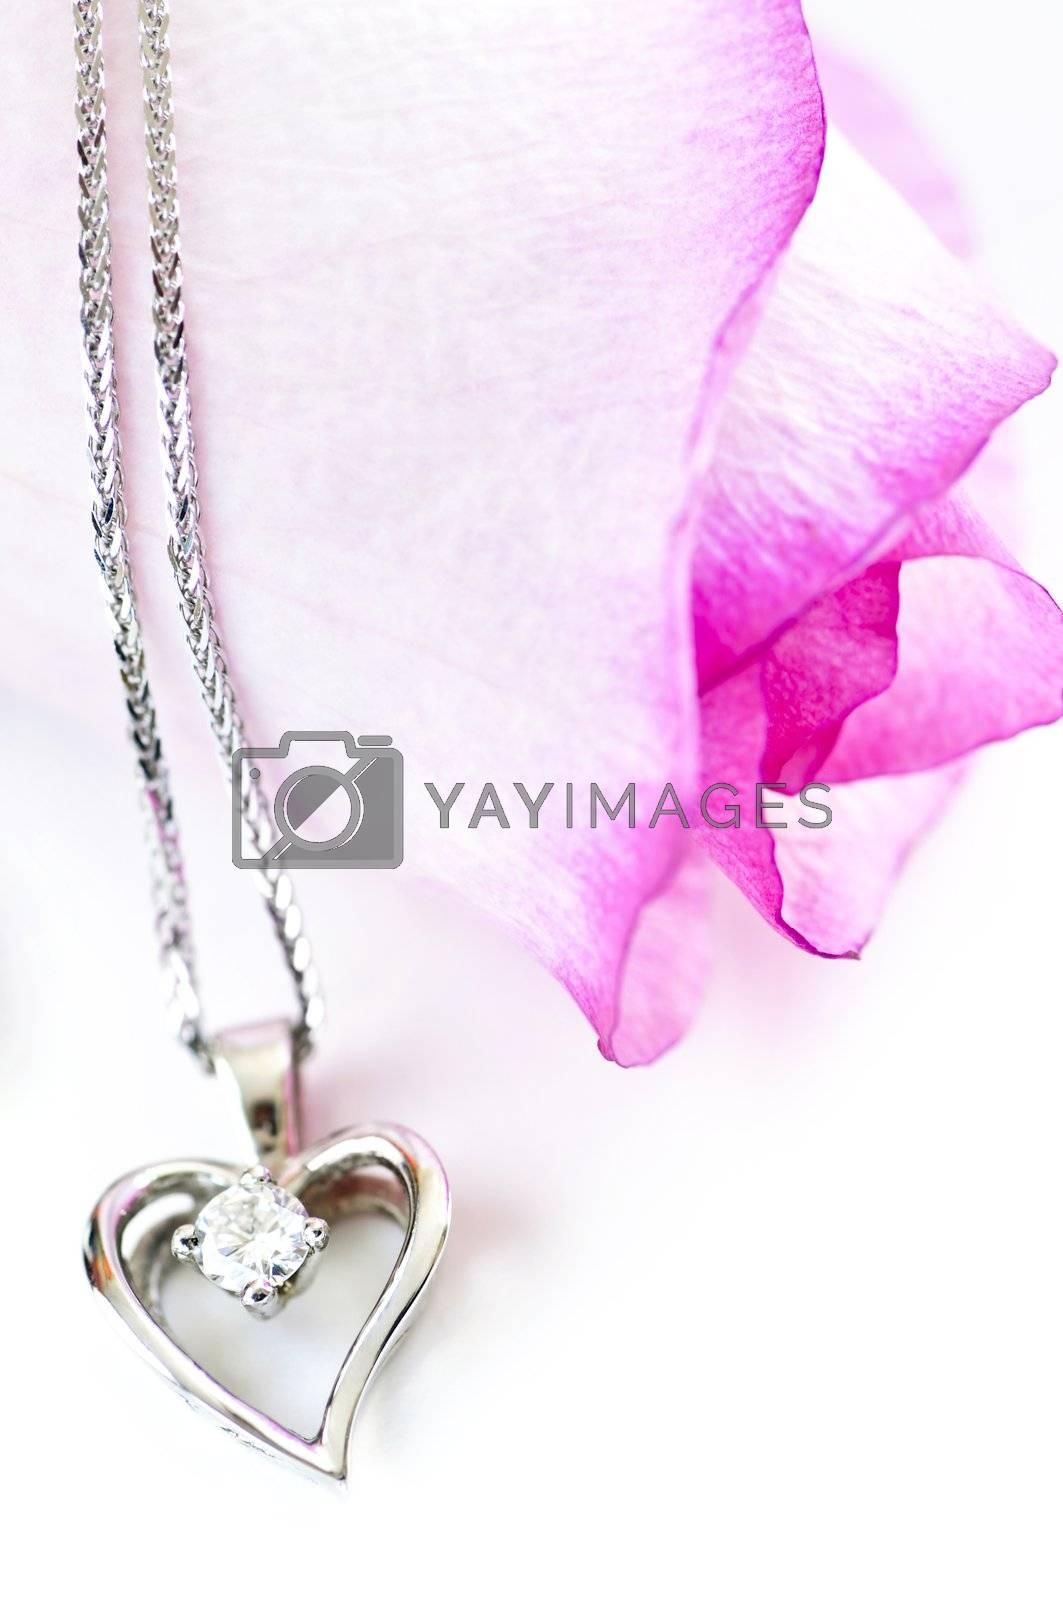 Diamond necklace on rose by elenathewise